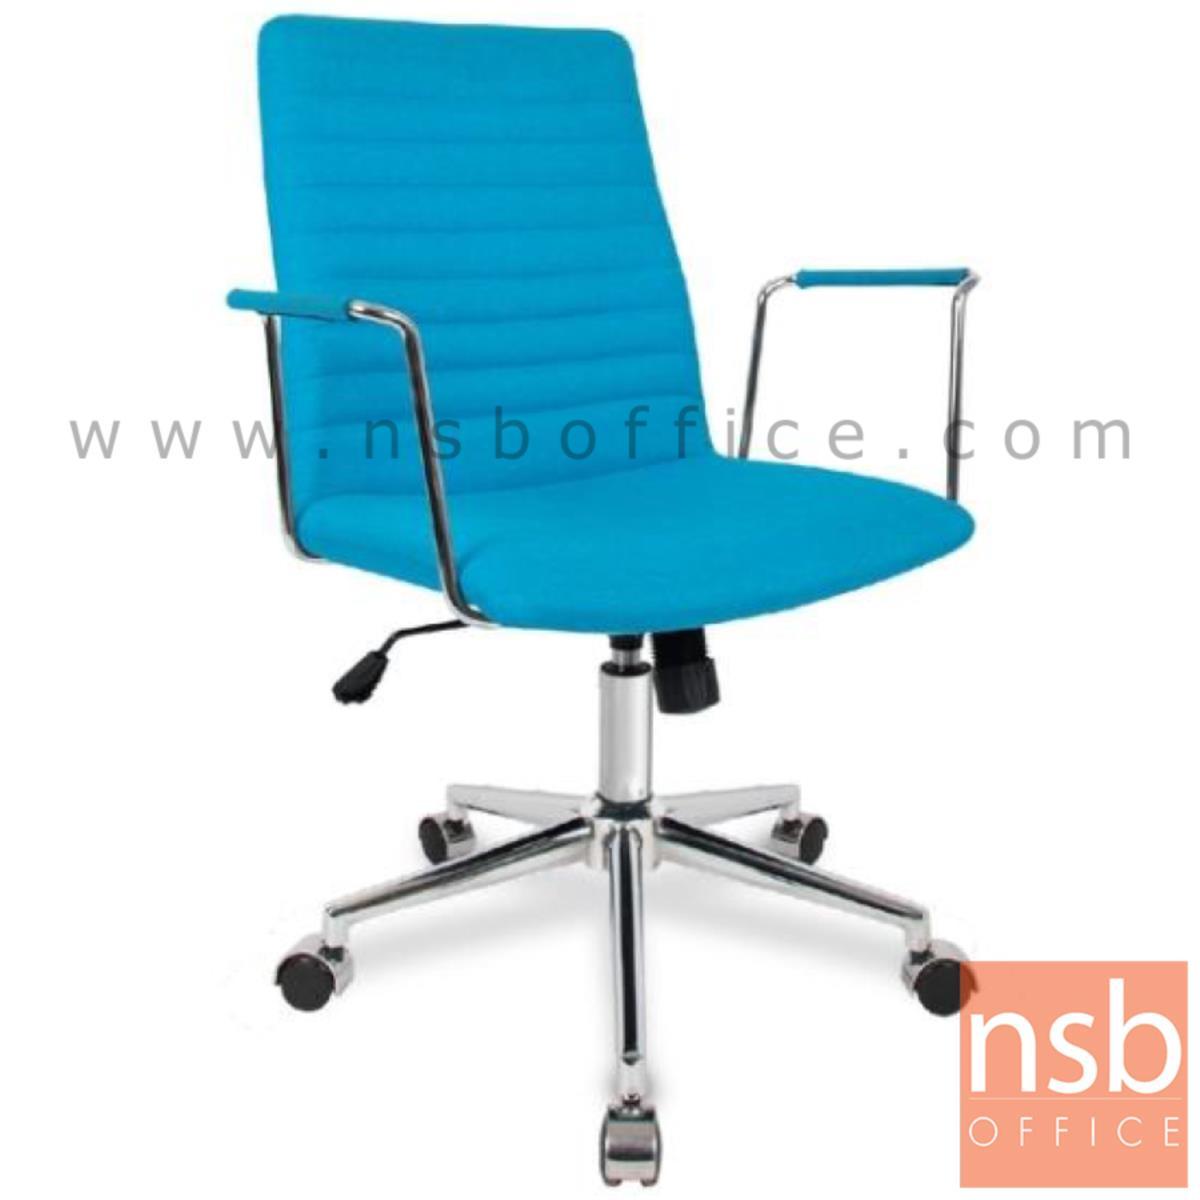 B03A444:เก้าอี้สำนักงาน รุ่น AC888C  โช๊คแก๊ส มีก้อนโยก ขาเหล็กชุบโครเมี่ยม